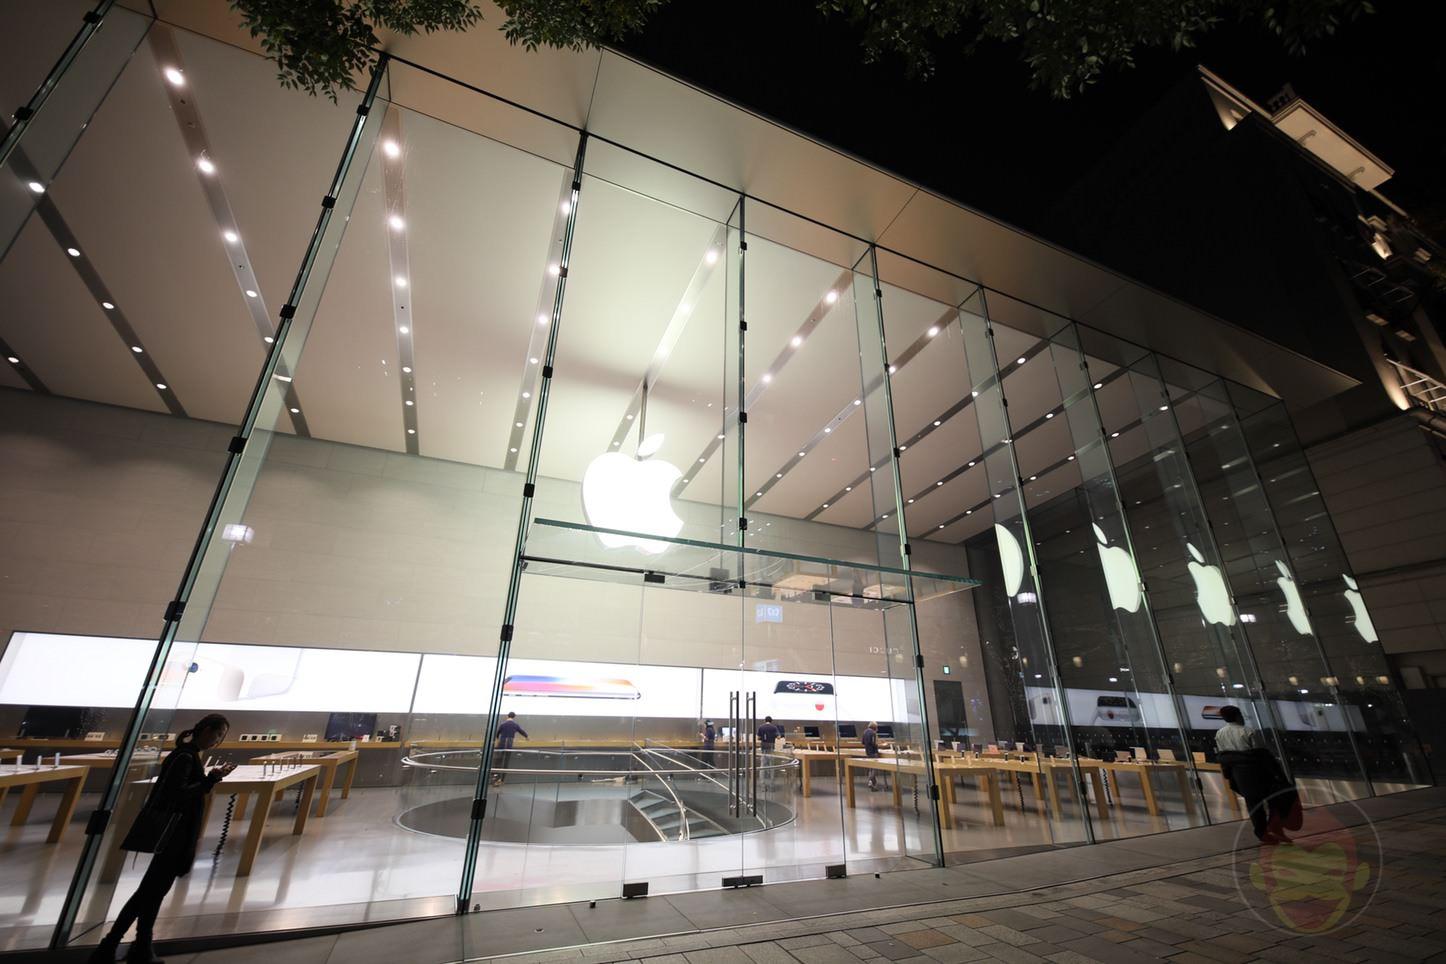 Apple Storeの行列を見に行ってきた